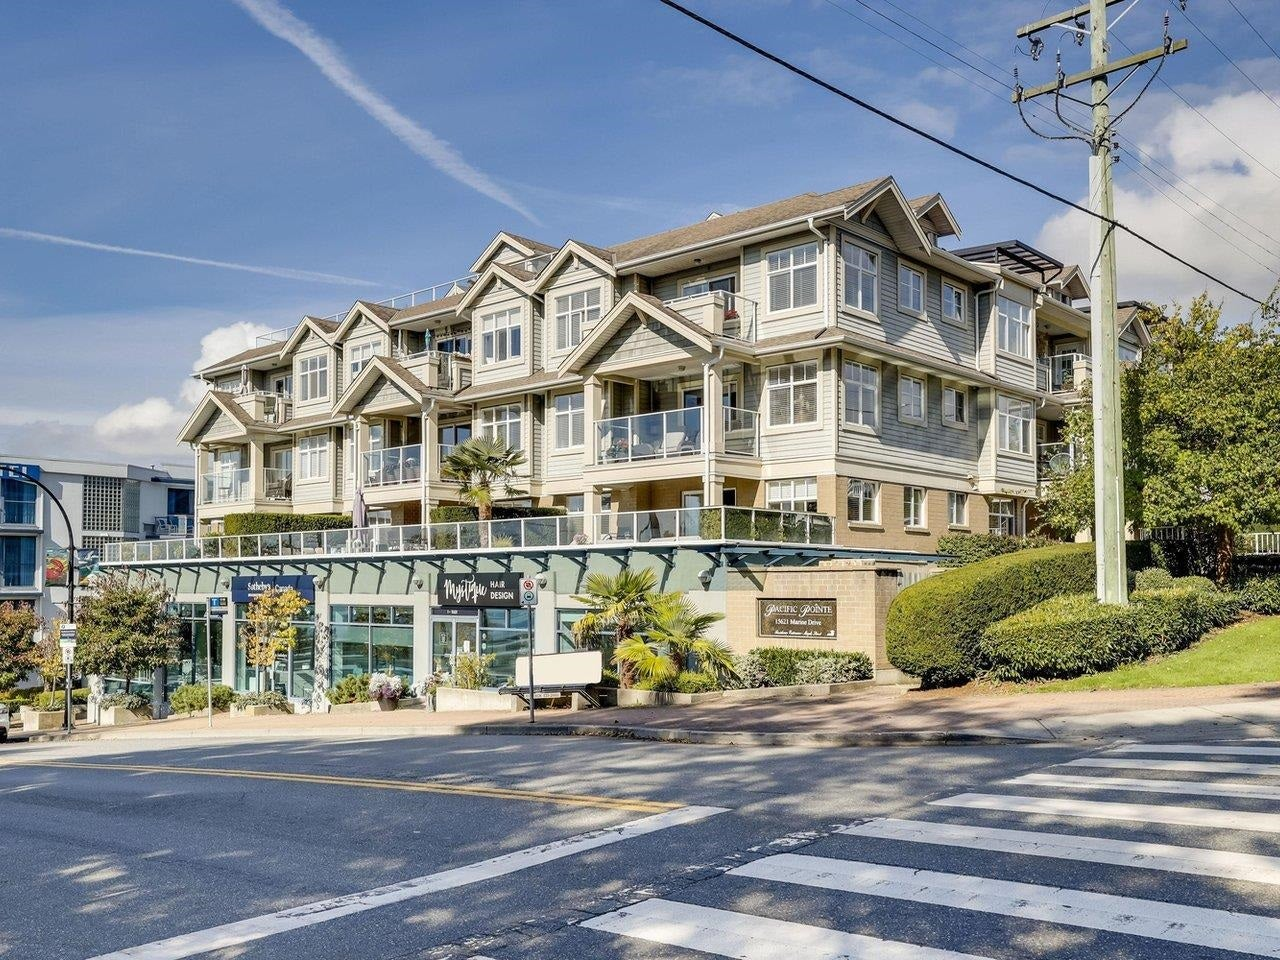 210 15621 MARINE DRIVE - White Rock Apartment/Condo for sale, 1 Bedroom (R2623591) - #1